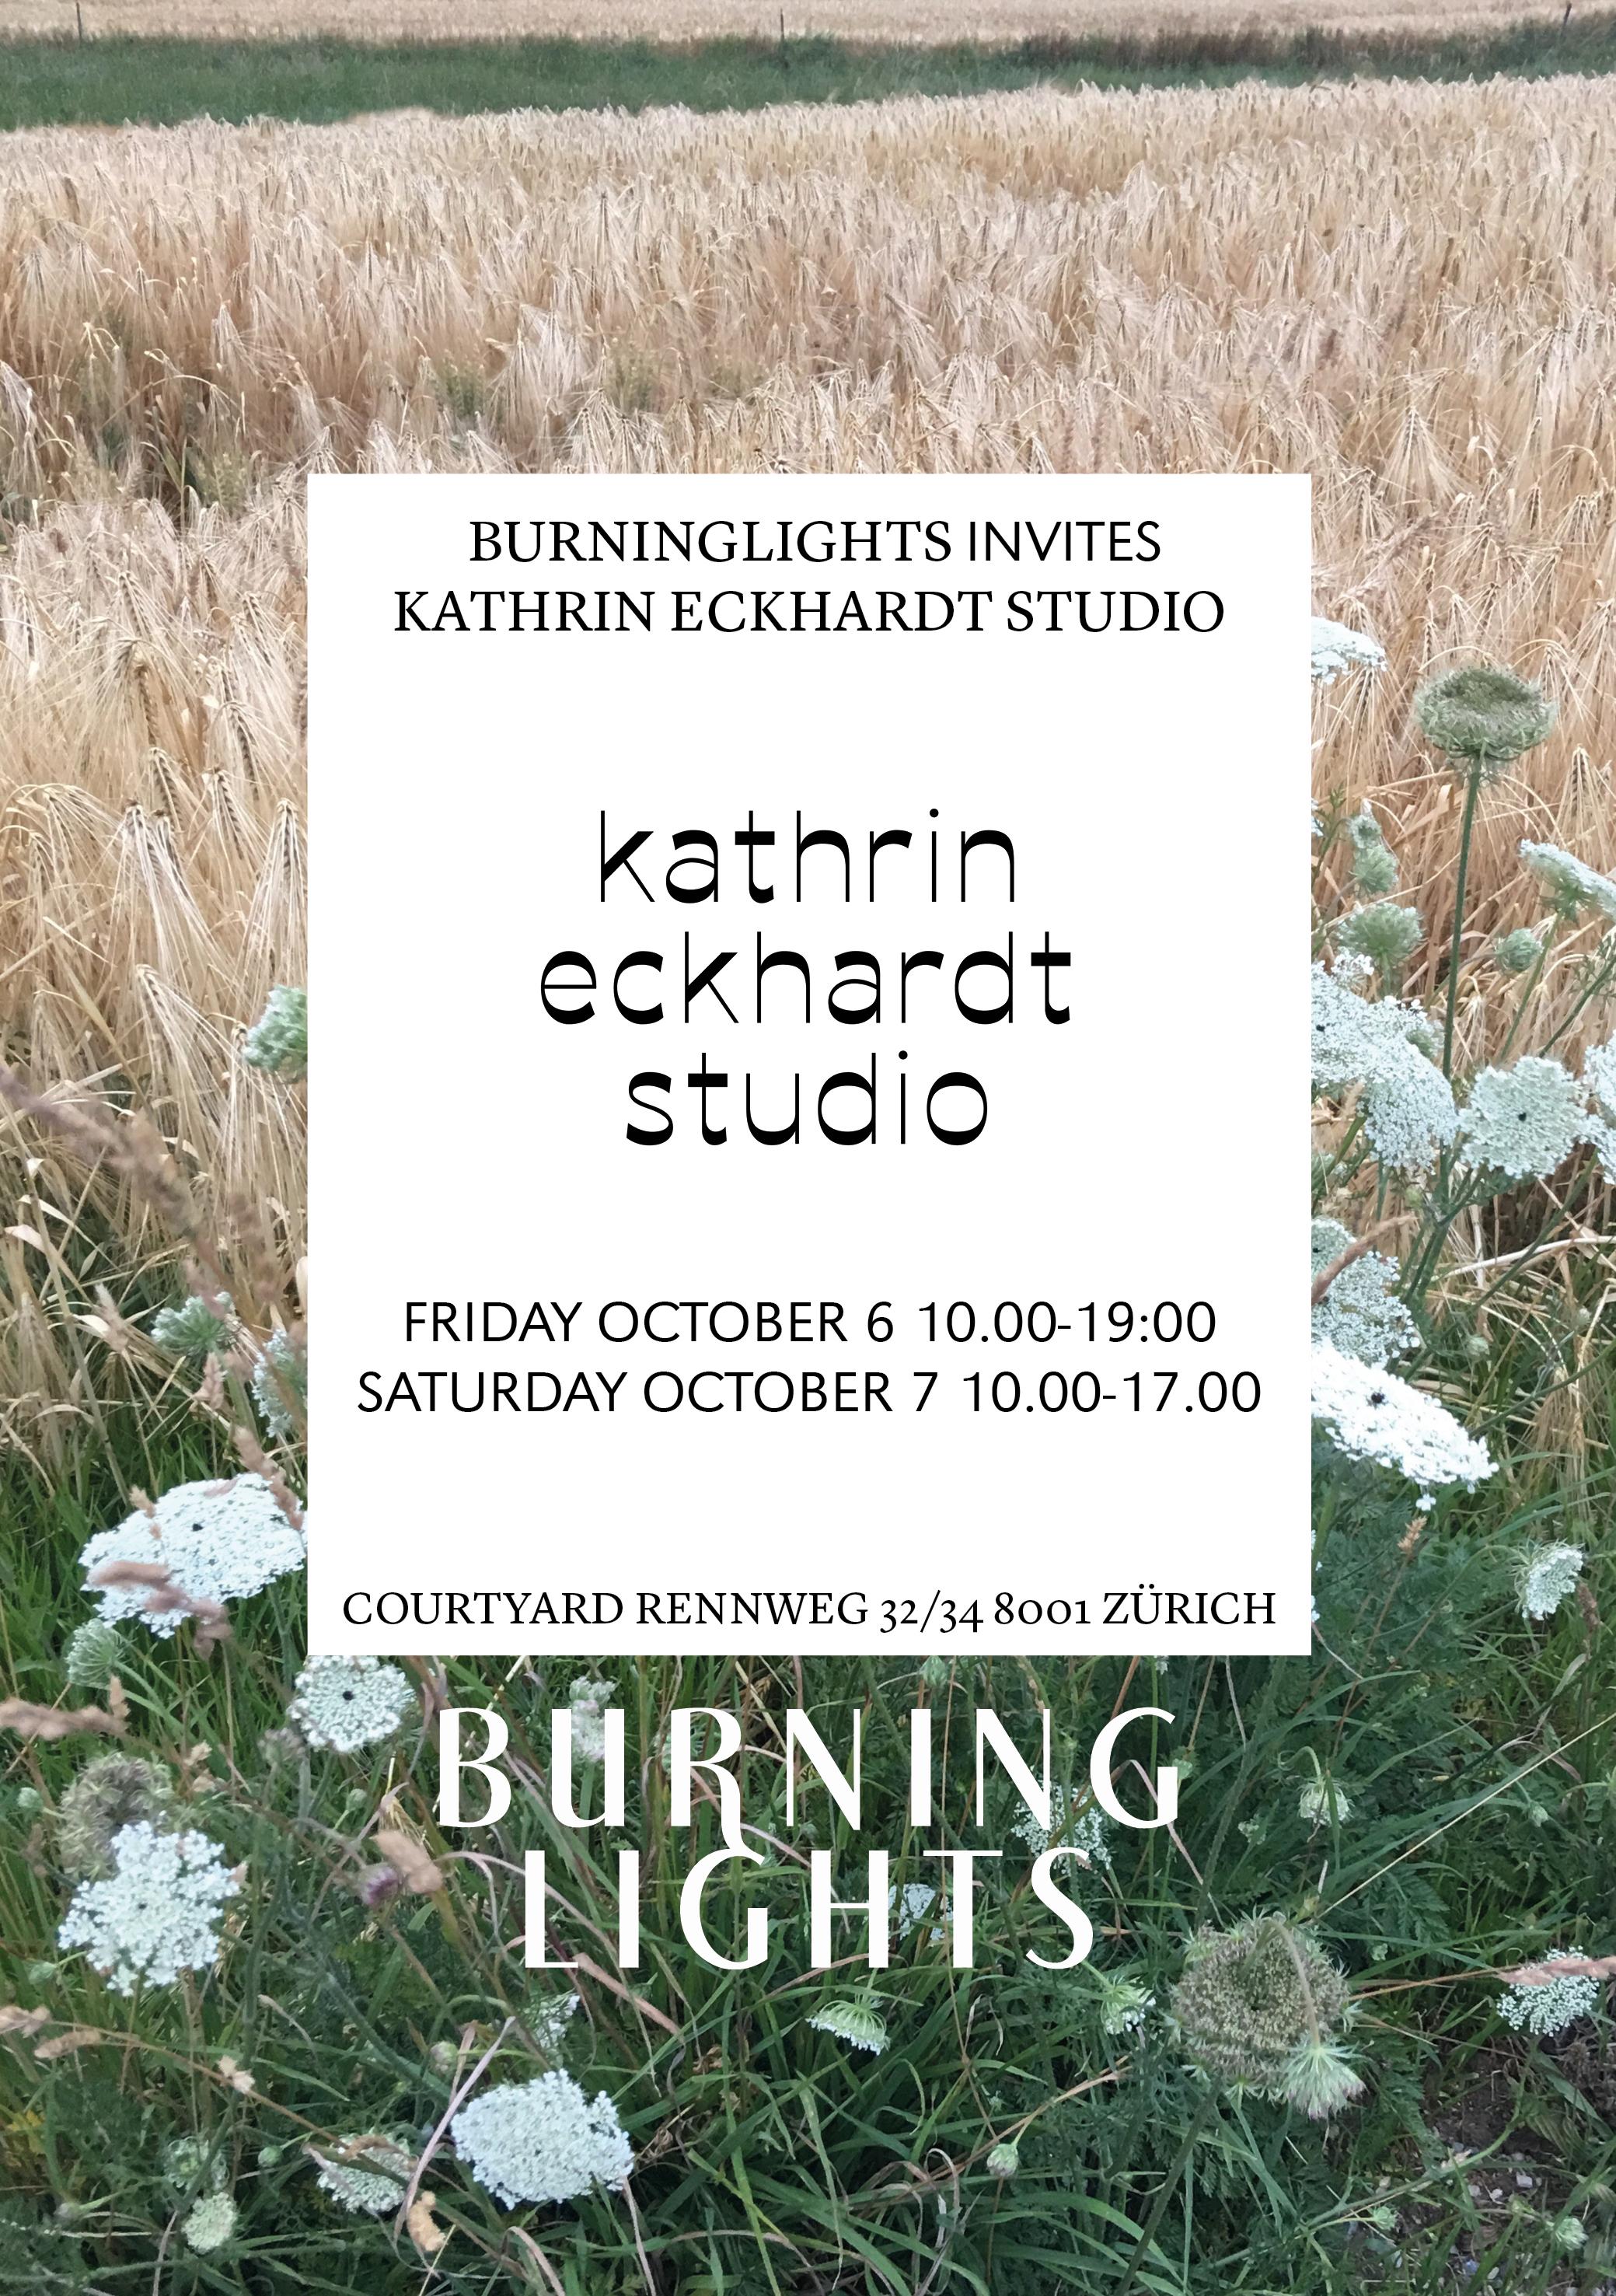 BURNINGLIGHTS_INVITES_KATHRINECKHARDT_OKTFIELD.jpg